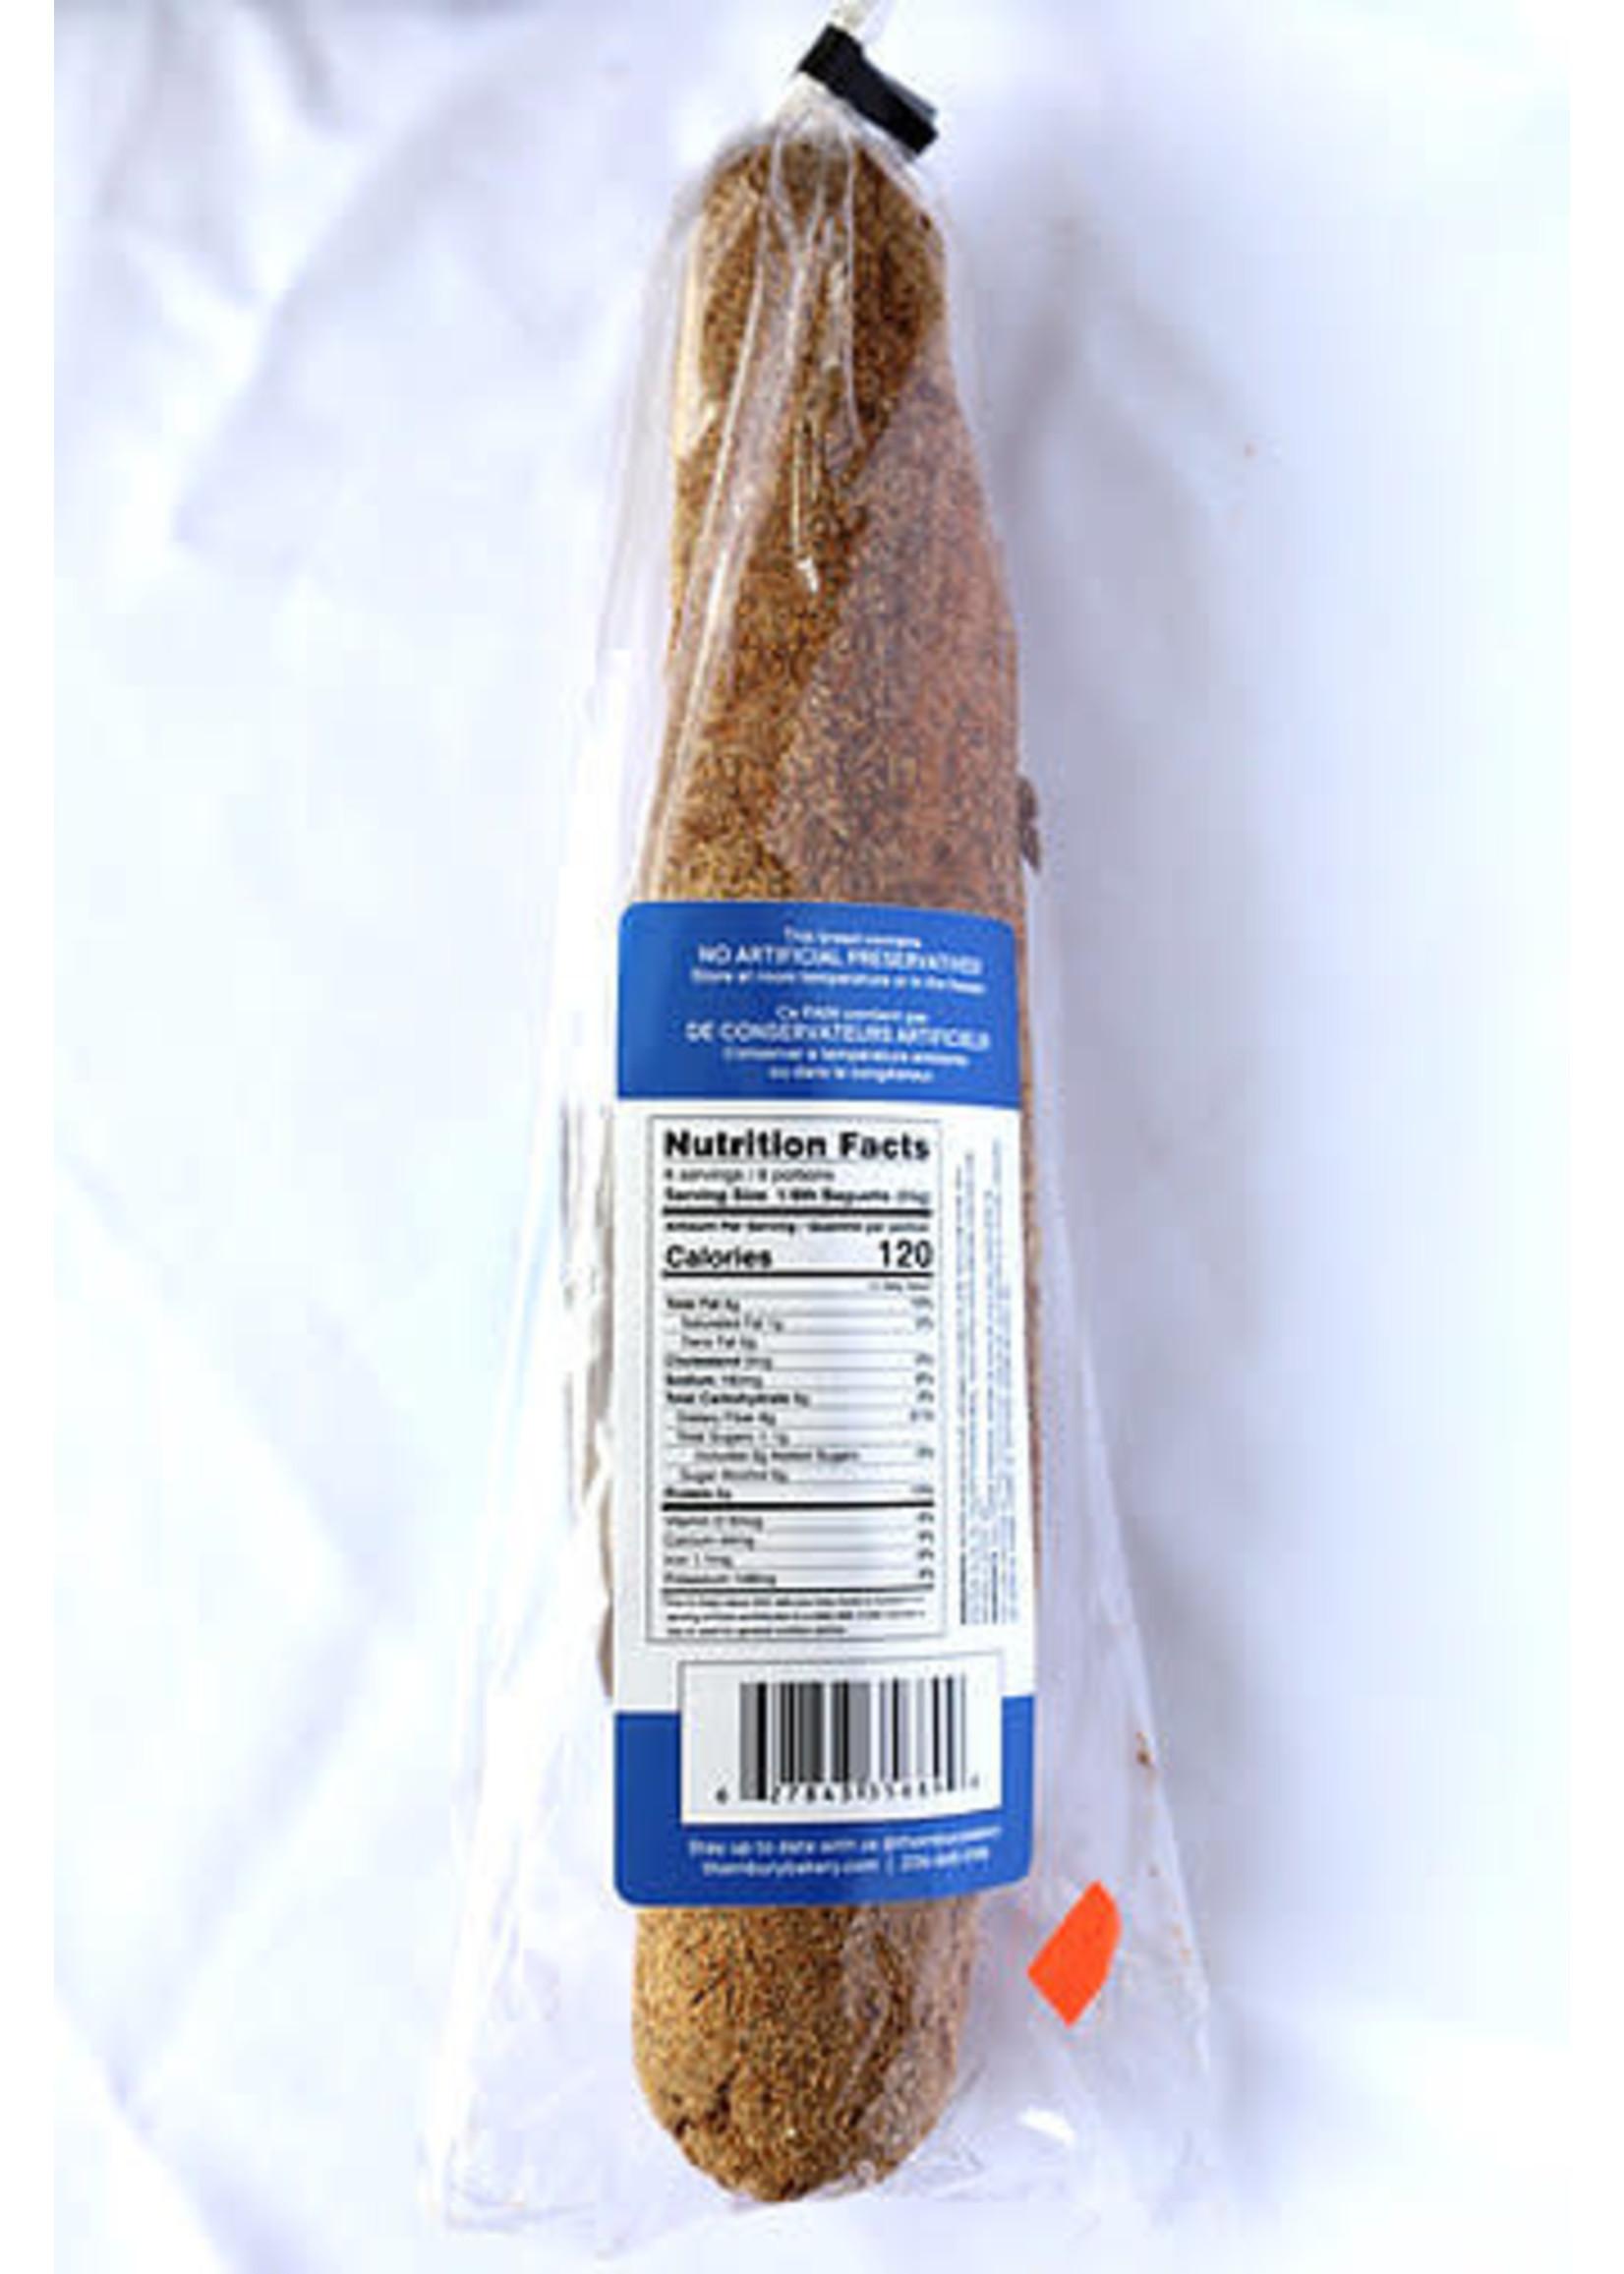 Thornbury Bakery Thornbury Bakery- KETO Baguette (GF)